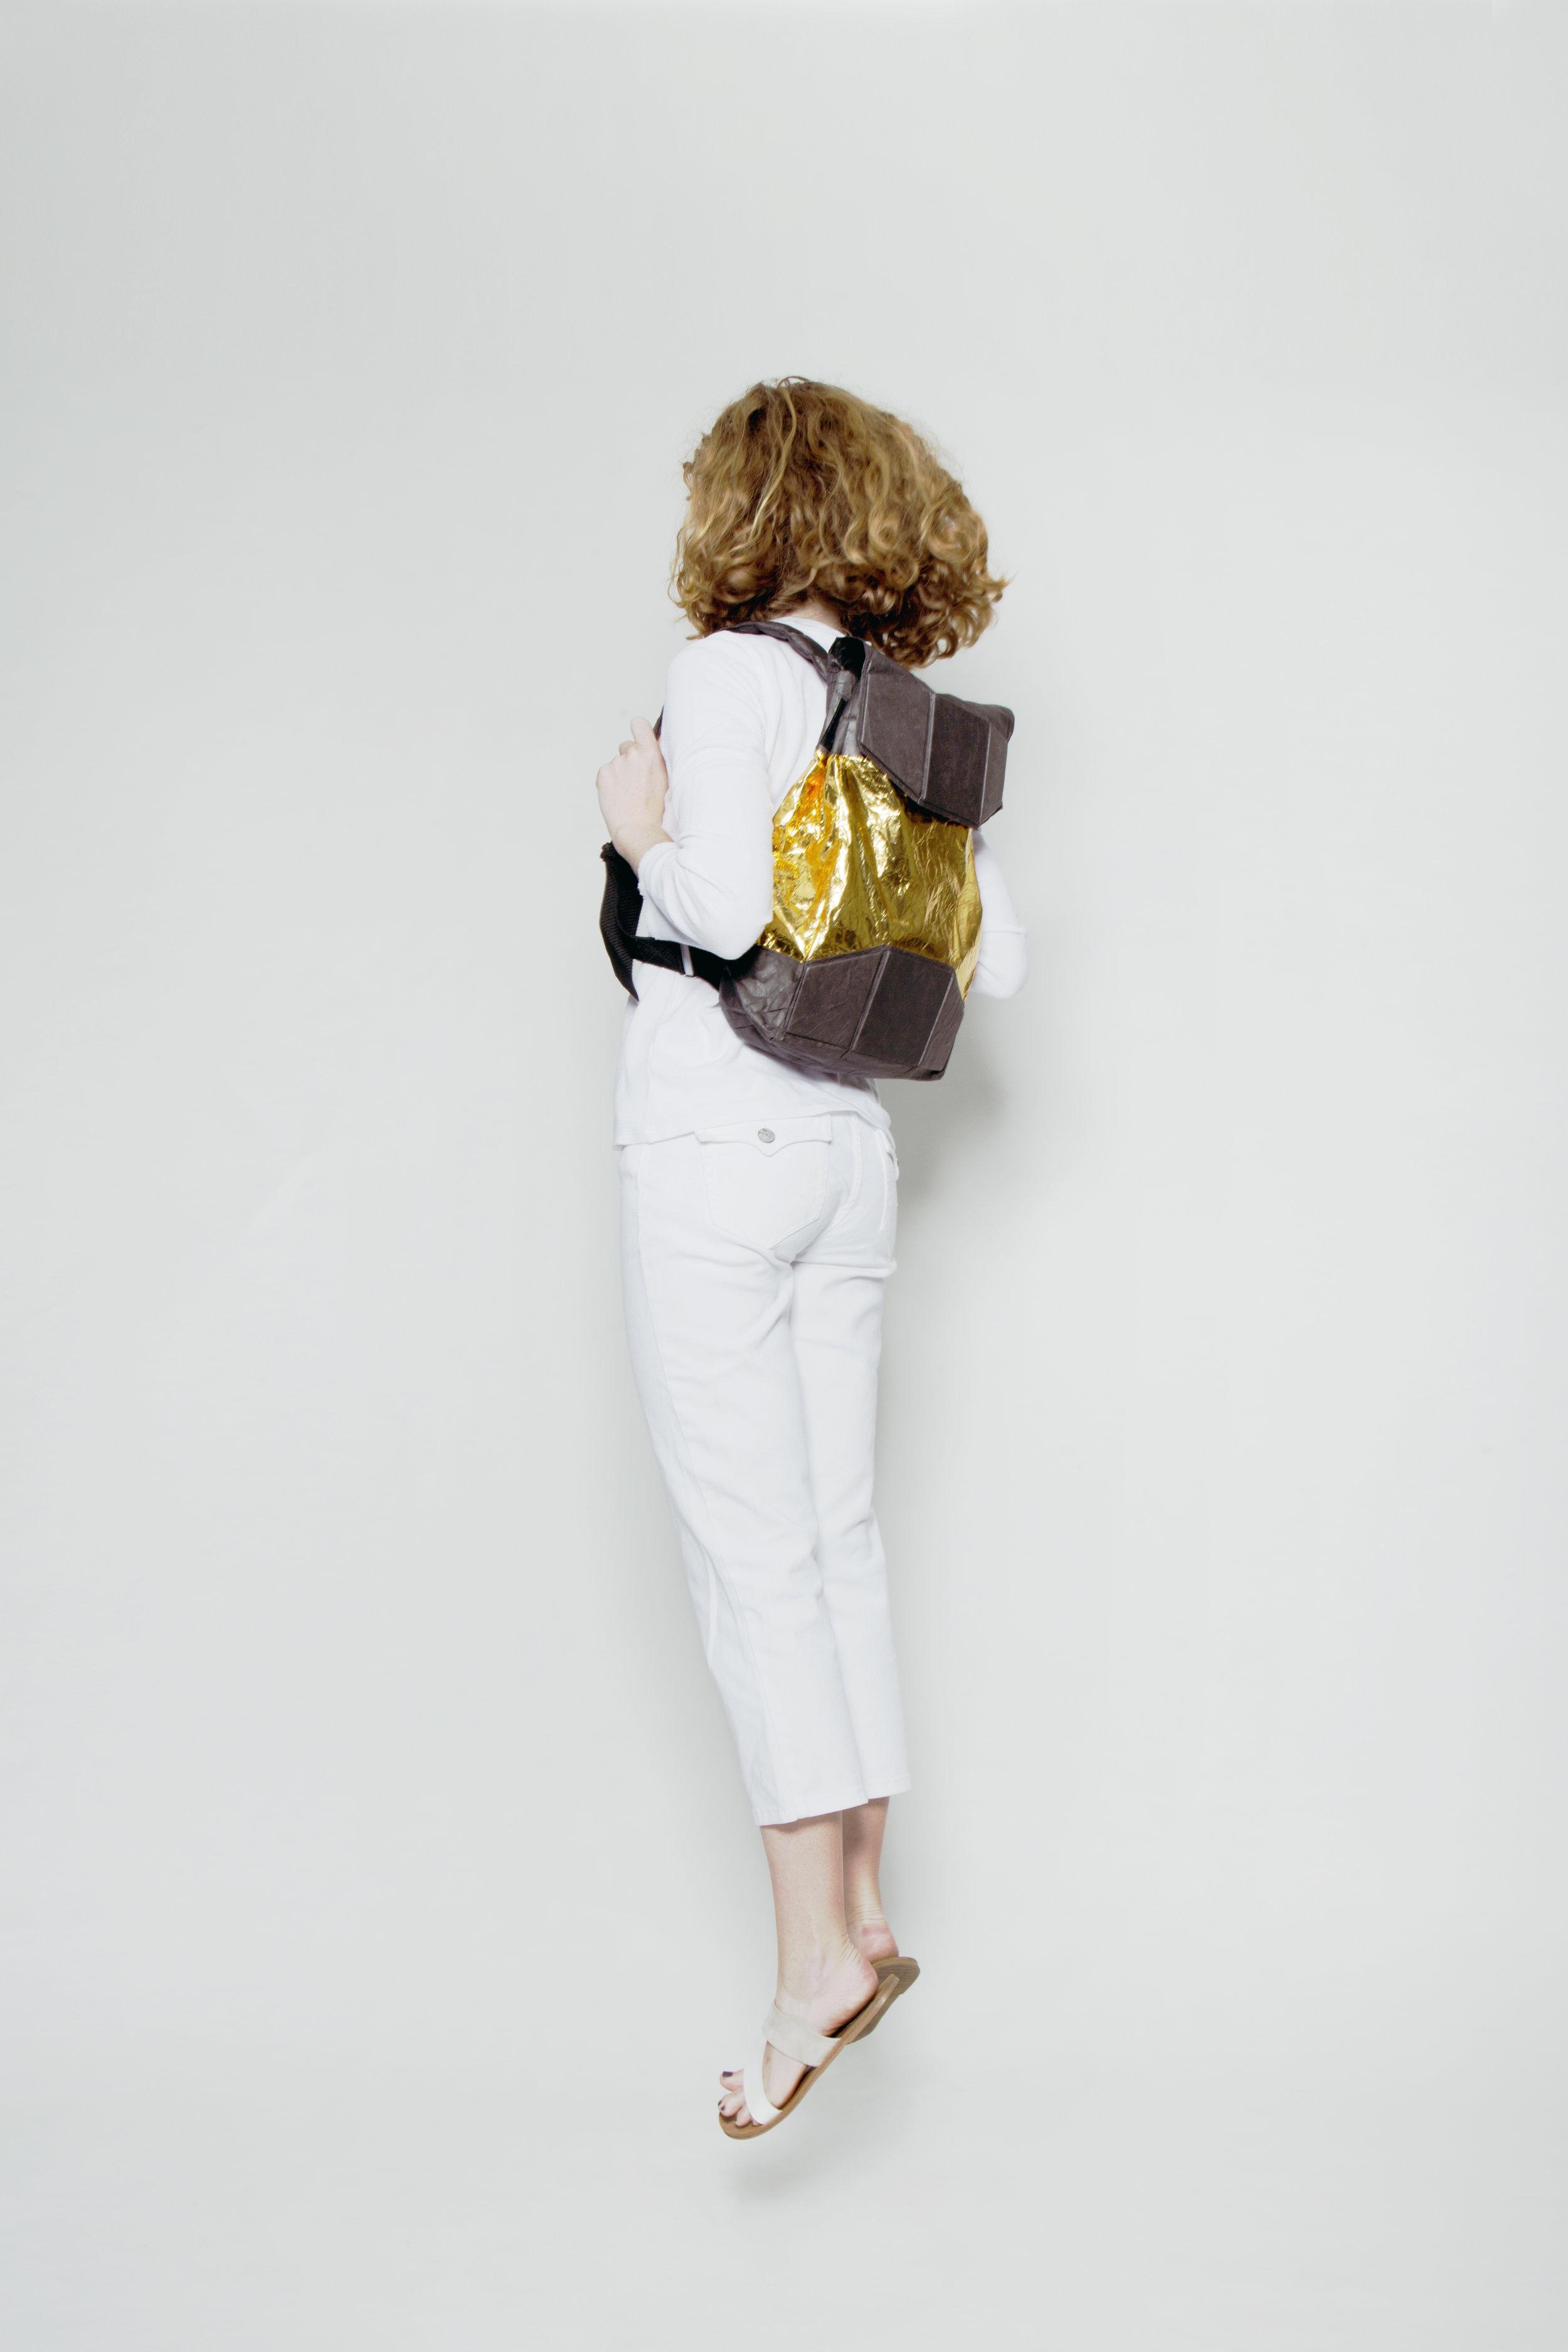 apolloback-pack-nogravity-nicholas-baker